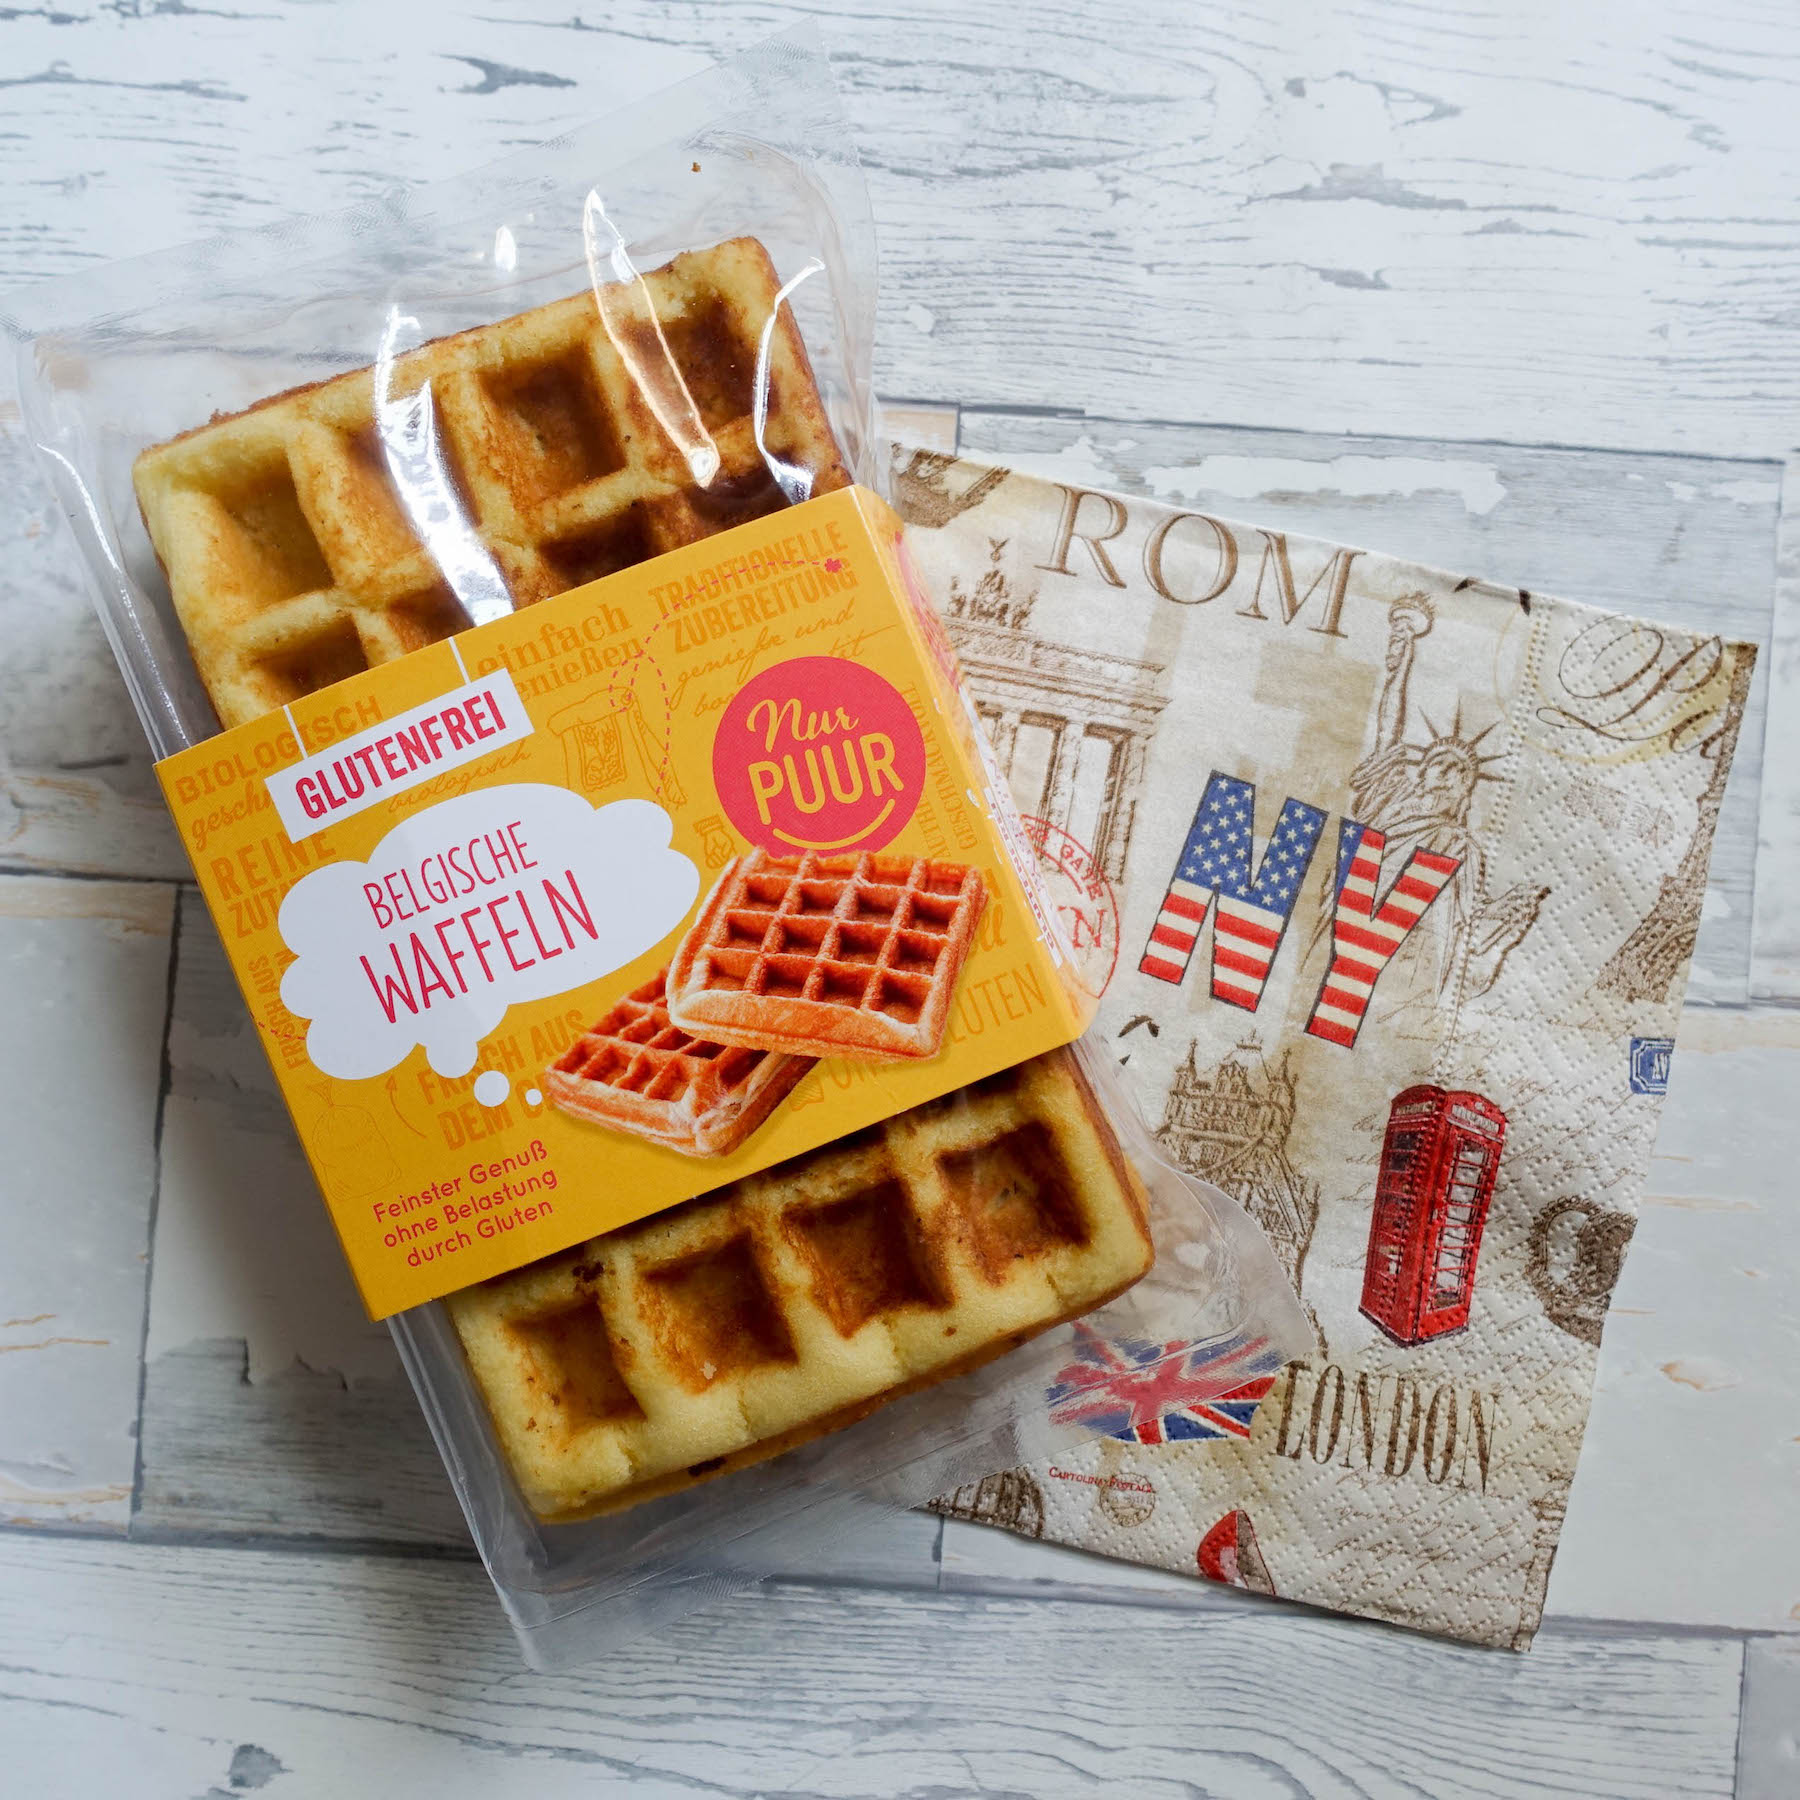 suelovesnyc_susan_fengler_blog_glutenfrei_glutenfreie_belgische_waffeln_belgische_waffel